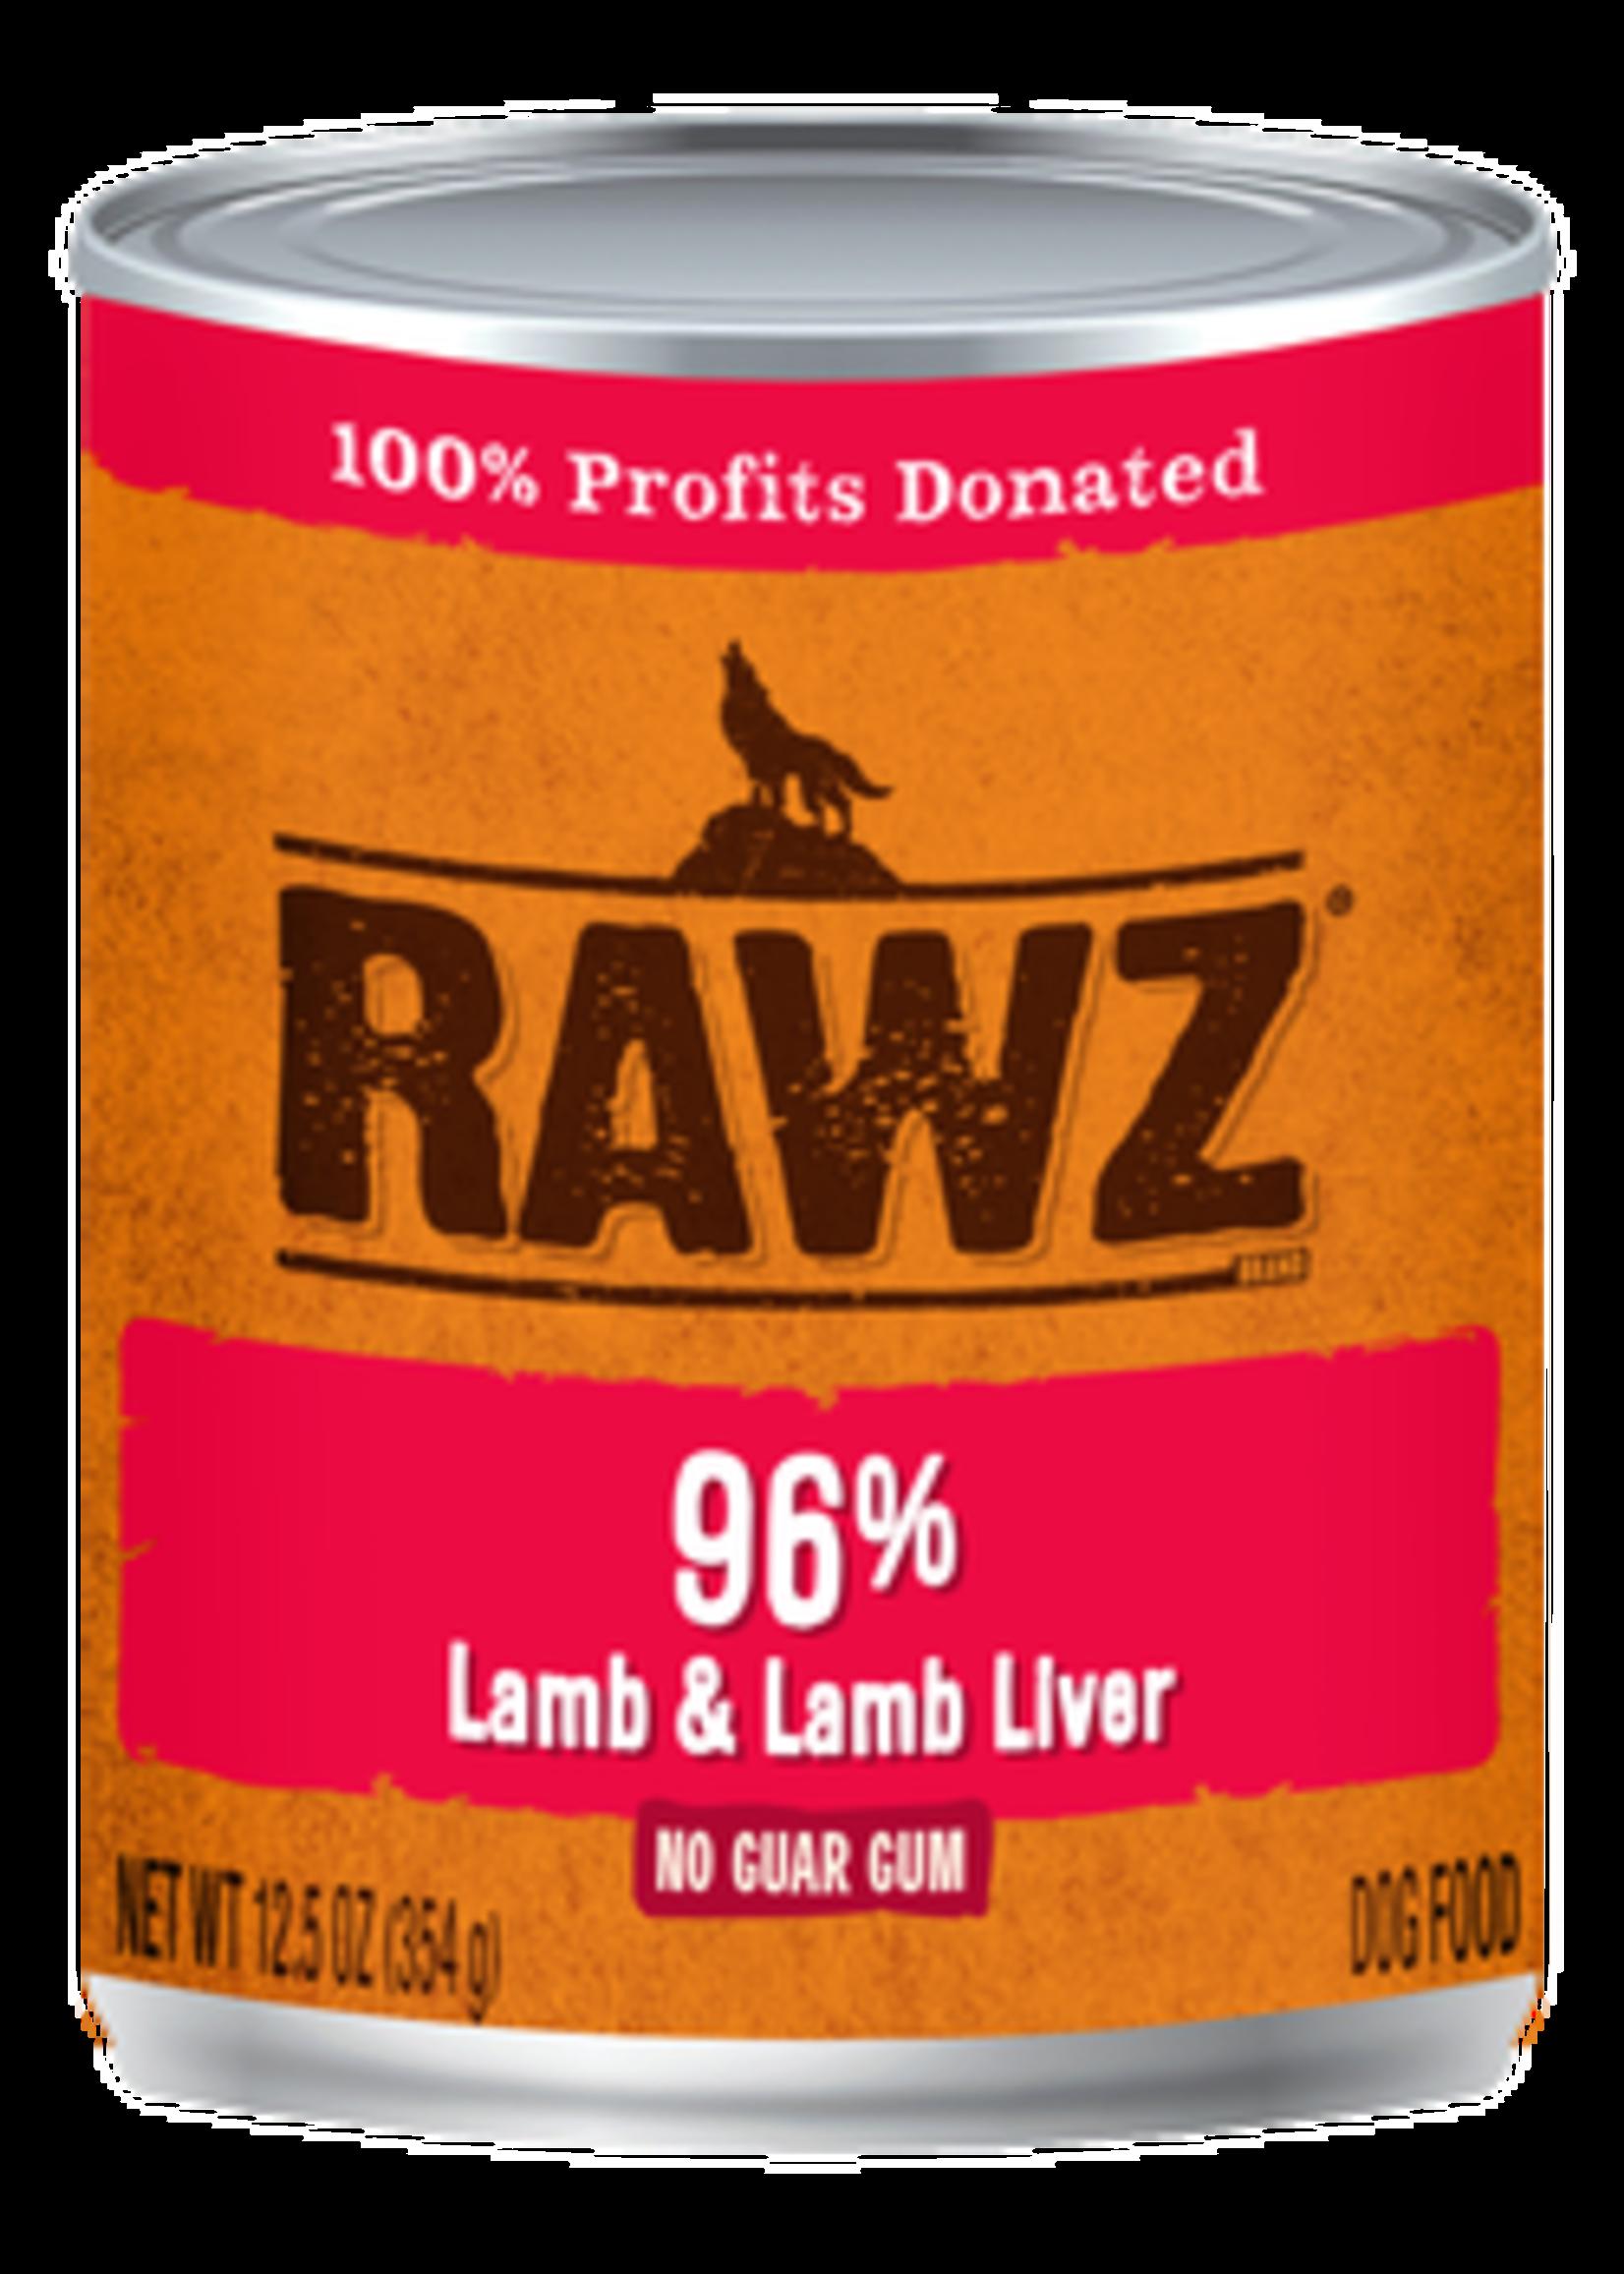 RAWZ RAWZ 96% Lamb/Liver K9 12.5 OZ